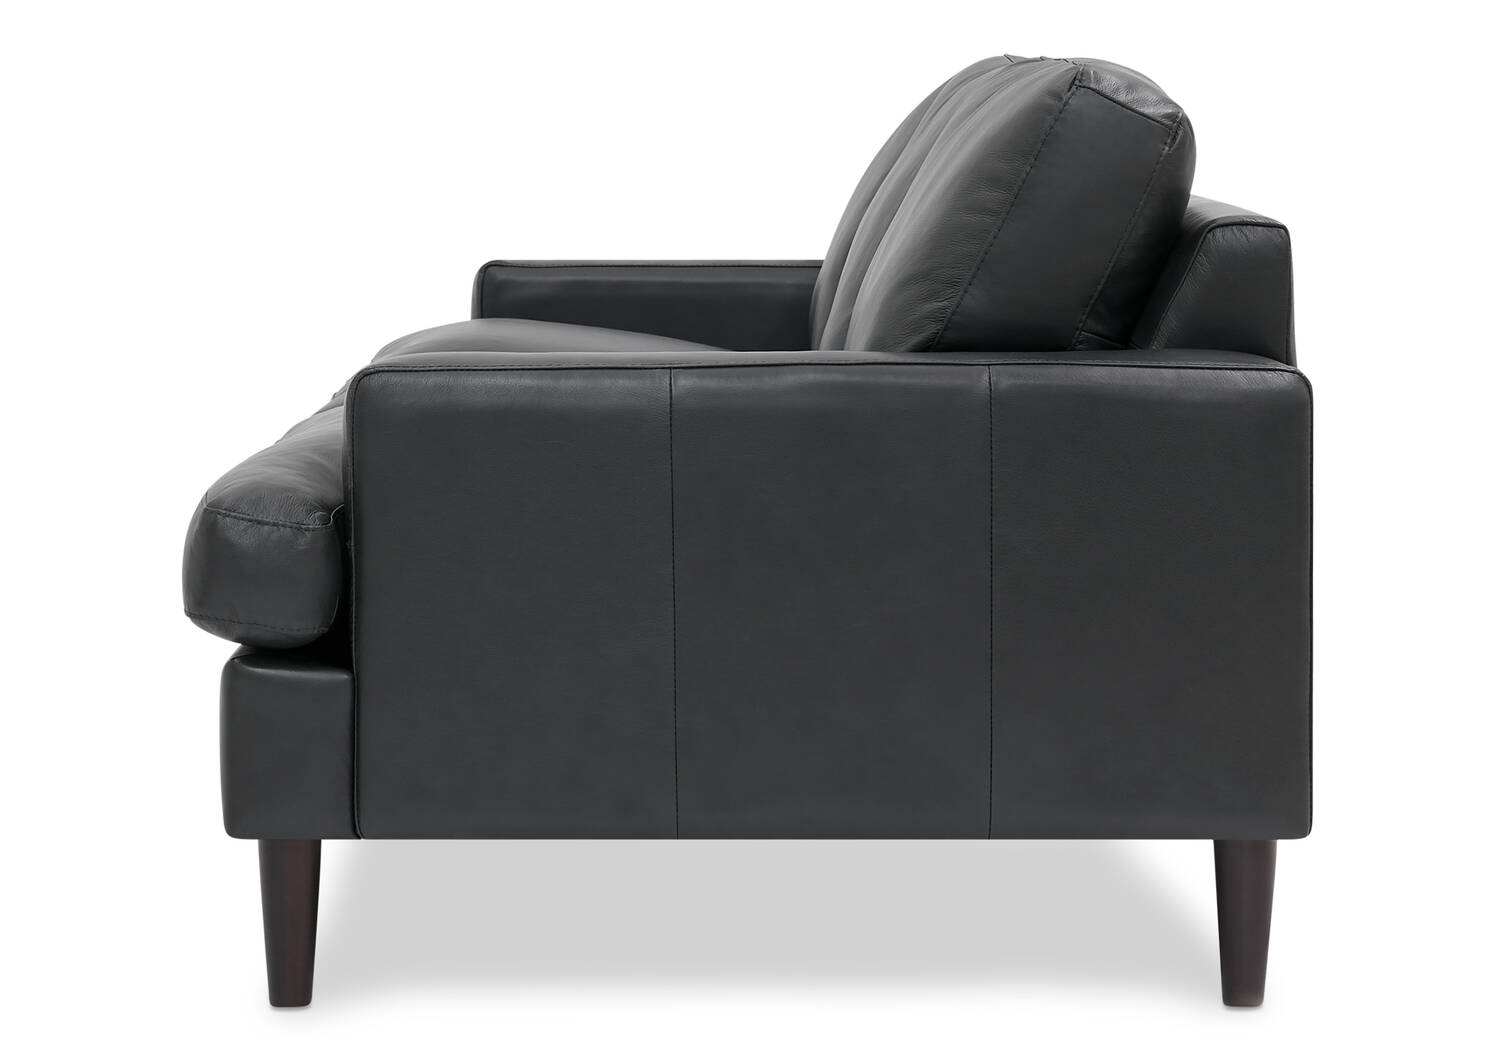 Canapé en cuir Savoy -Jett anthracite